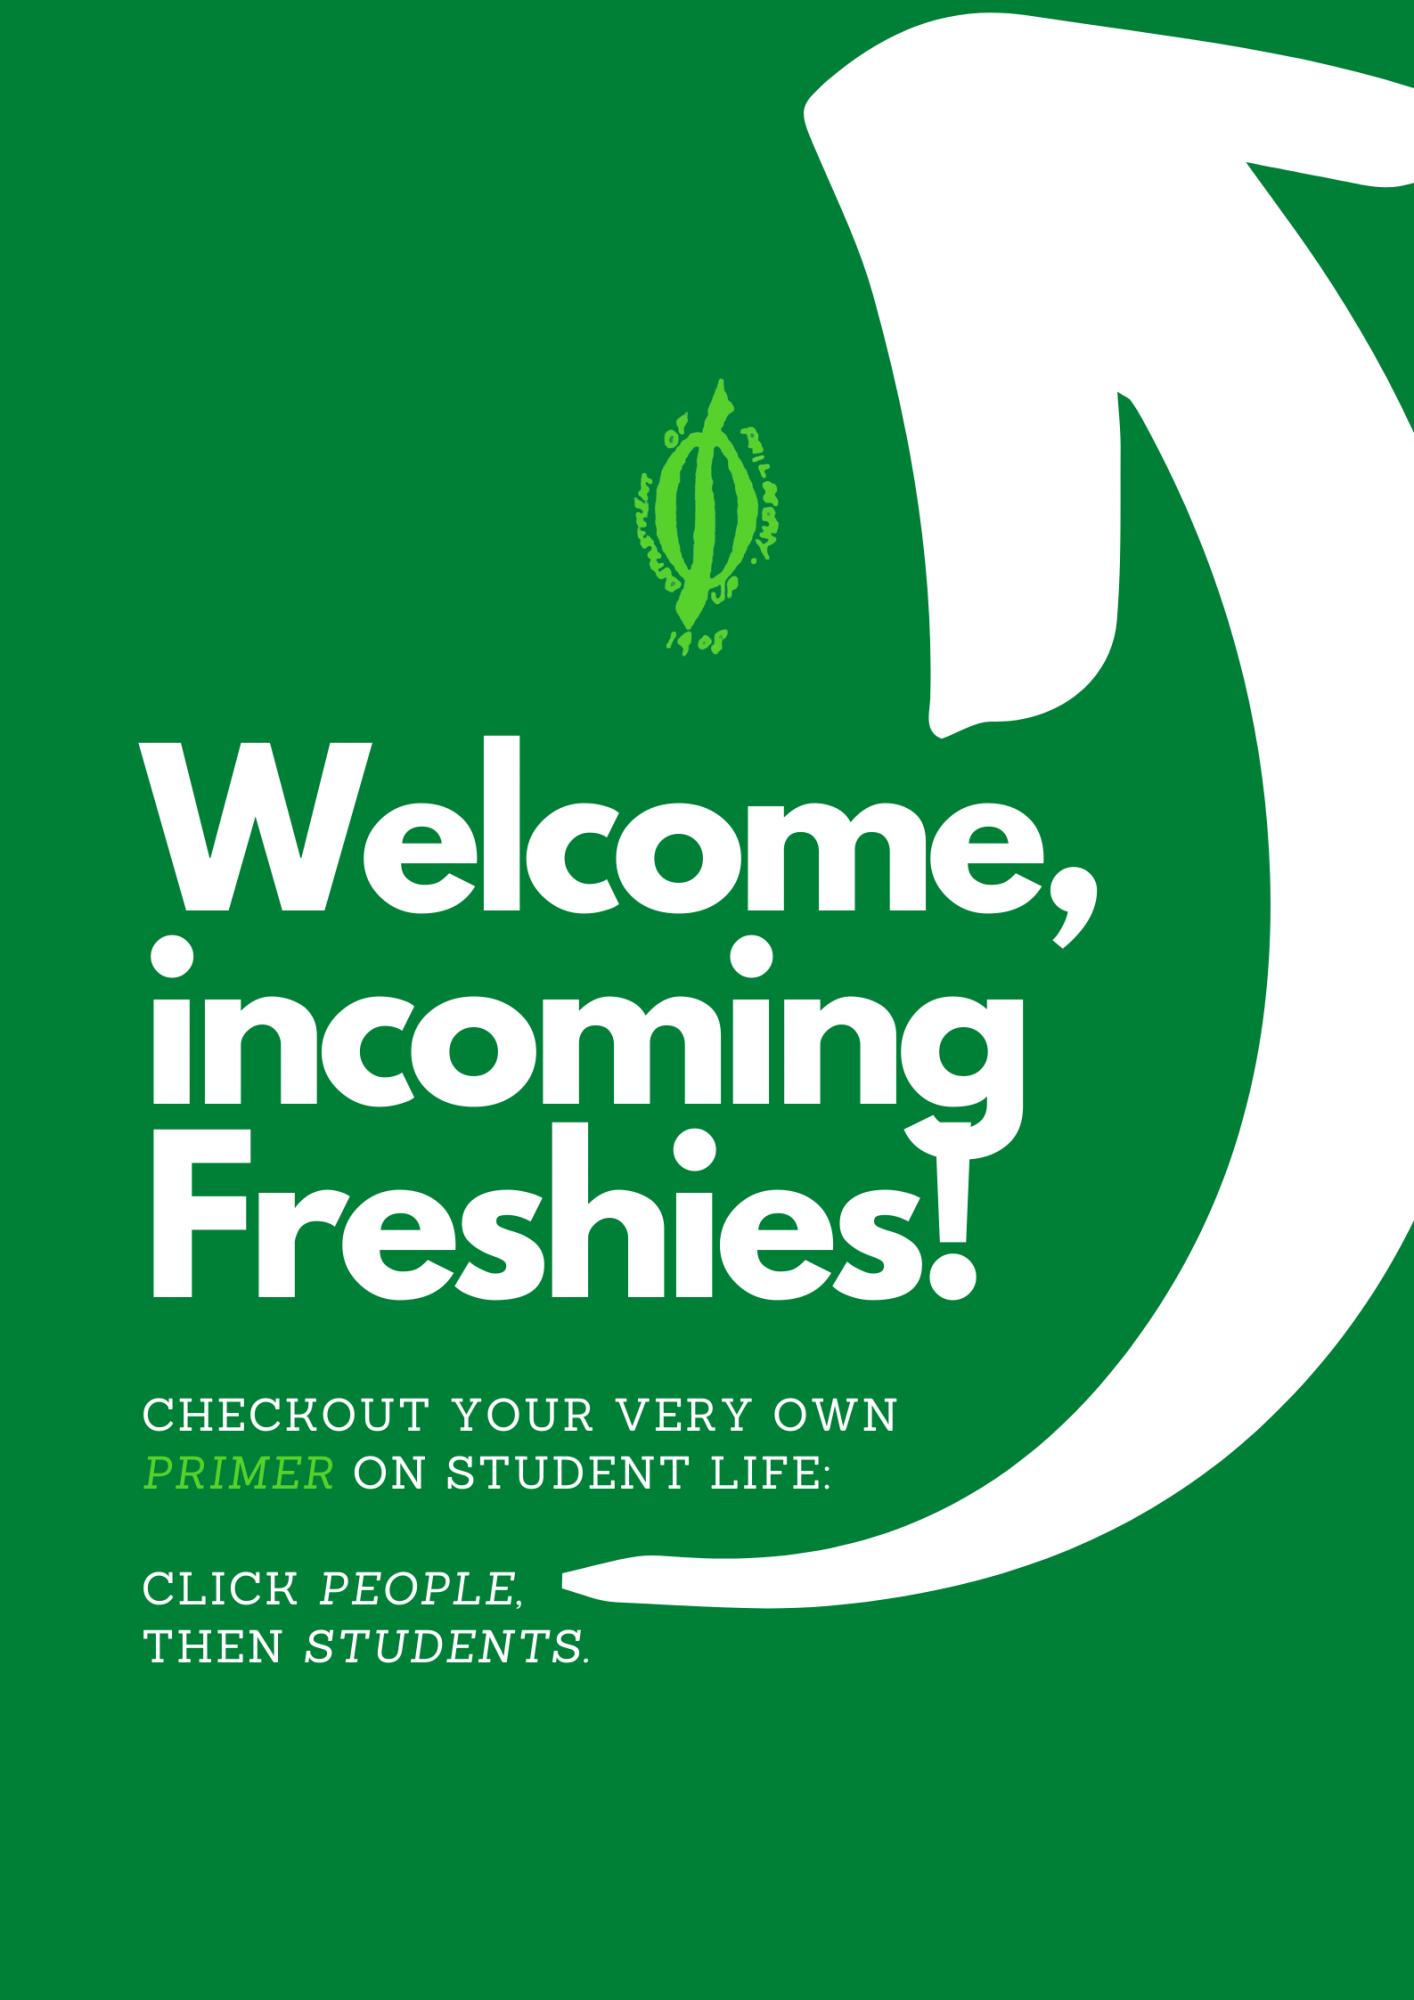 Welcome, Freshies!